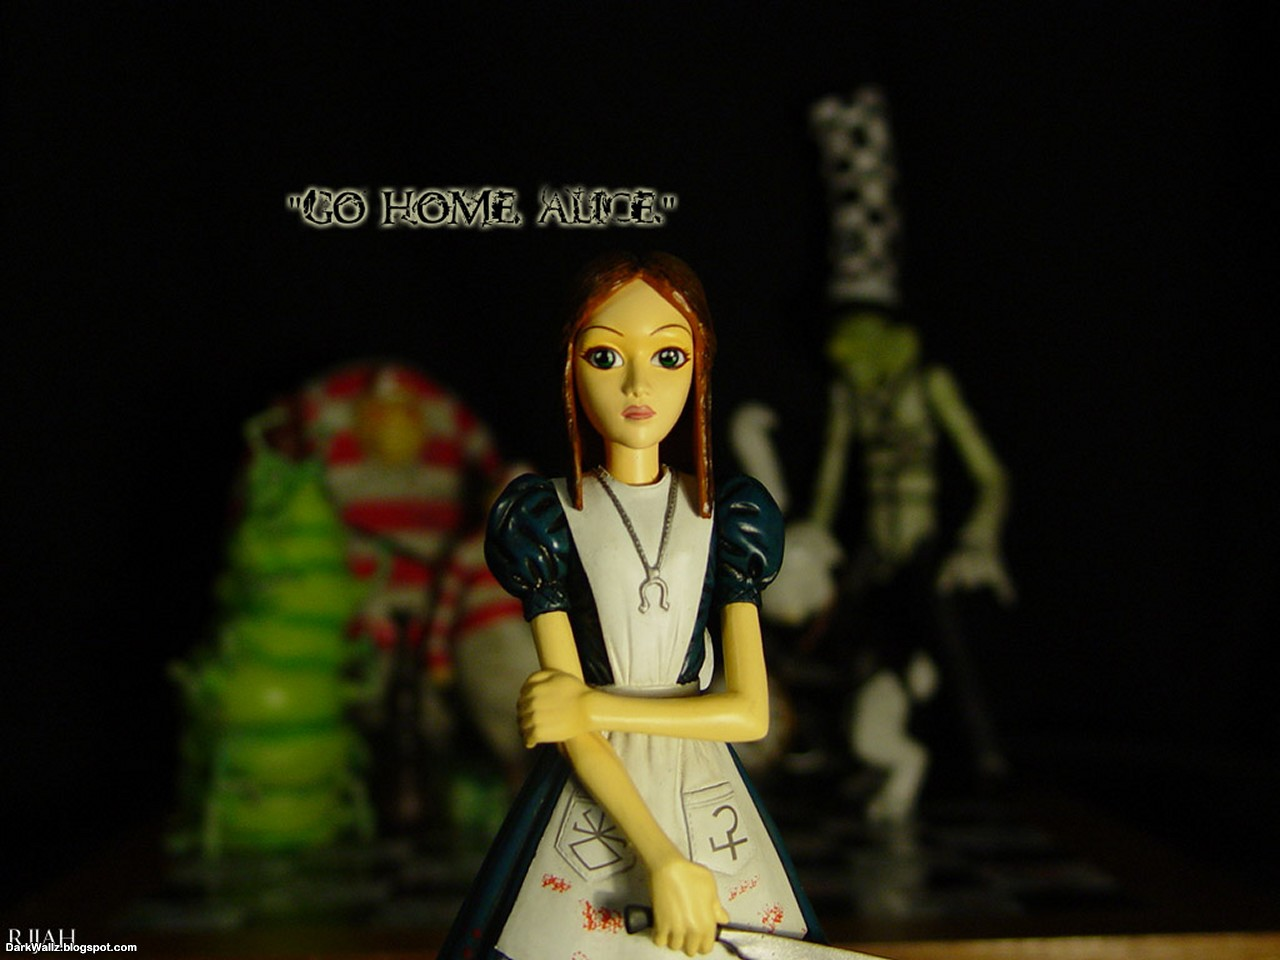 Go Home Alice | Dark Wallpaper Download